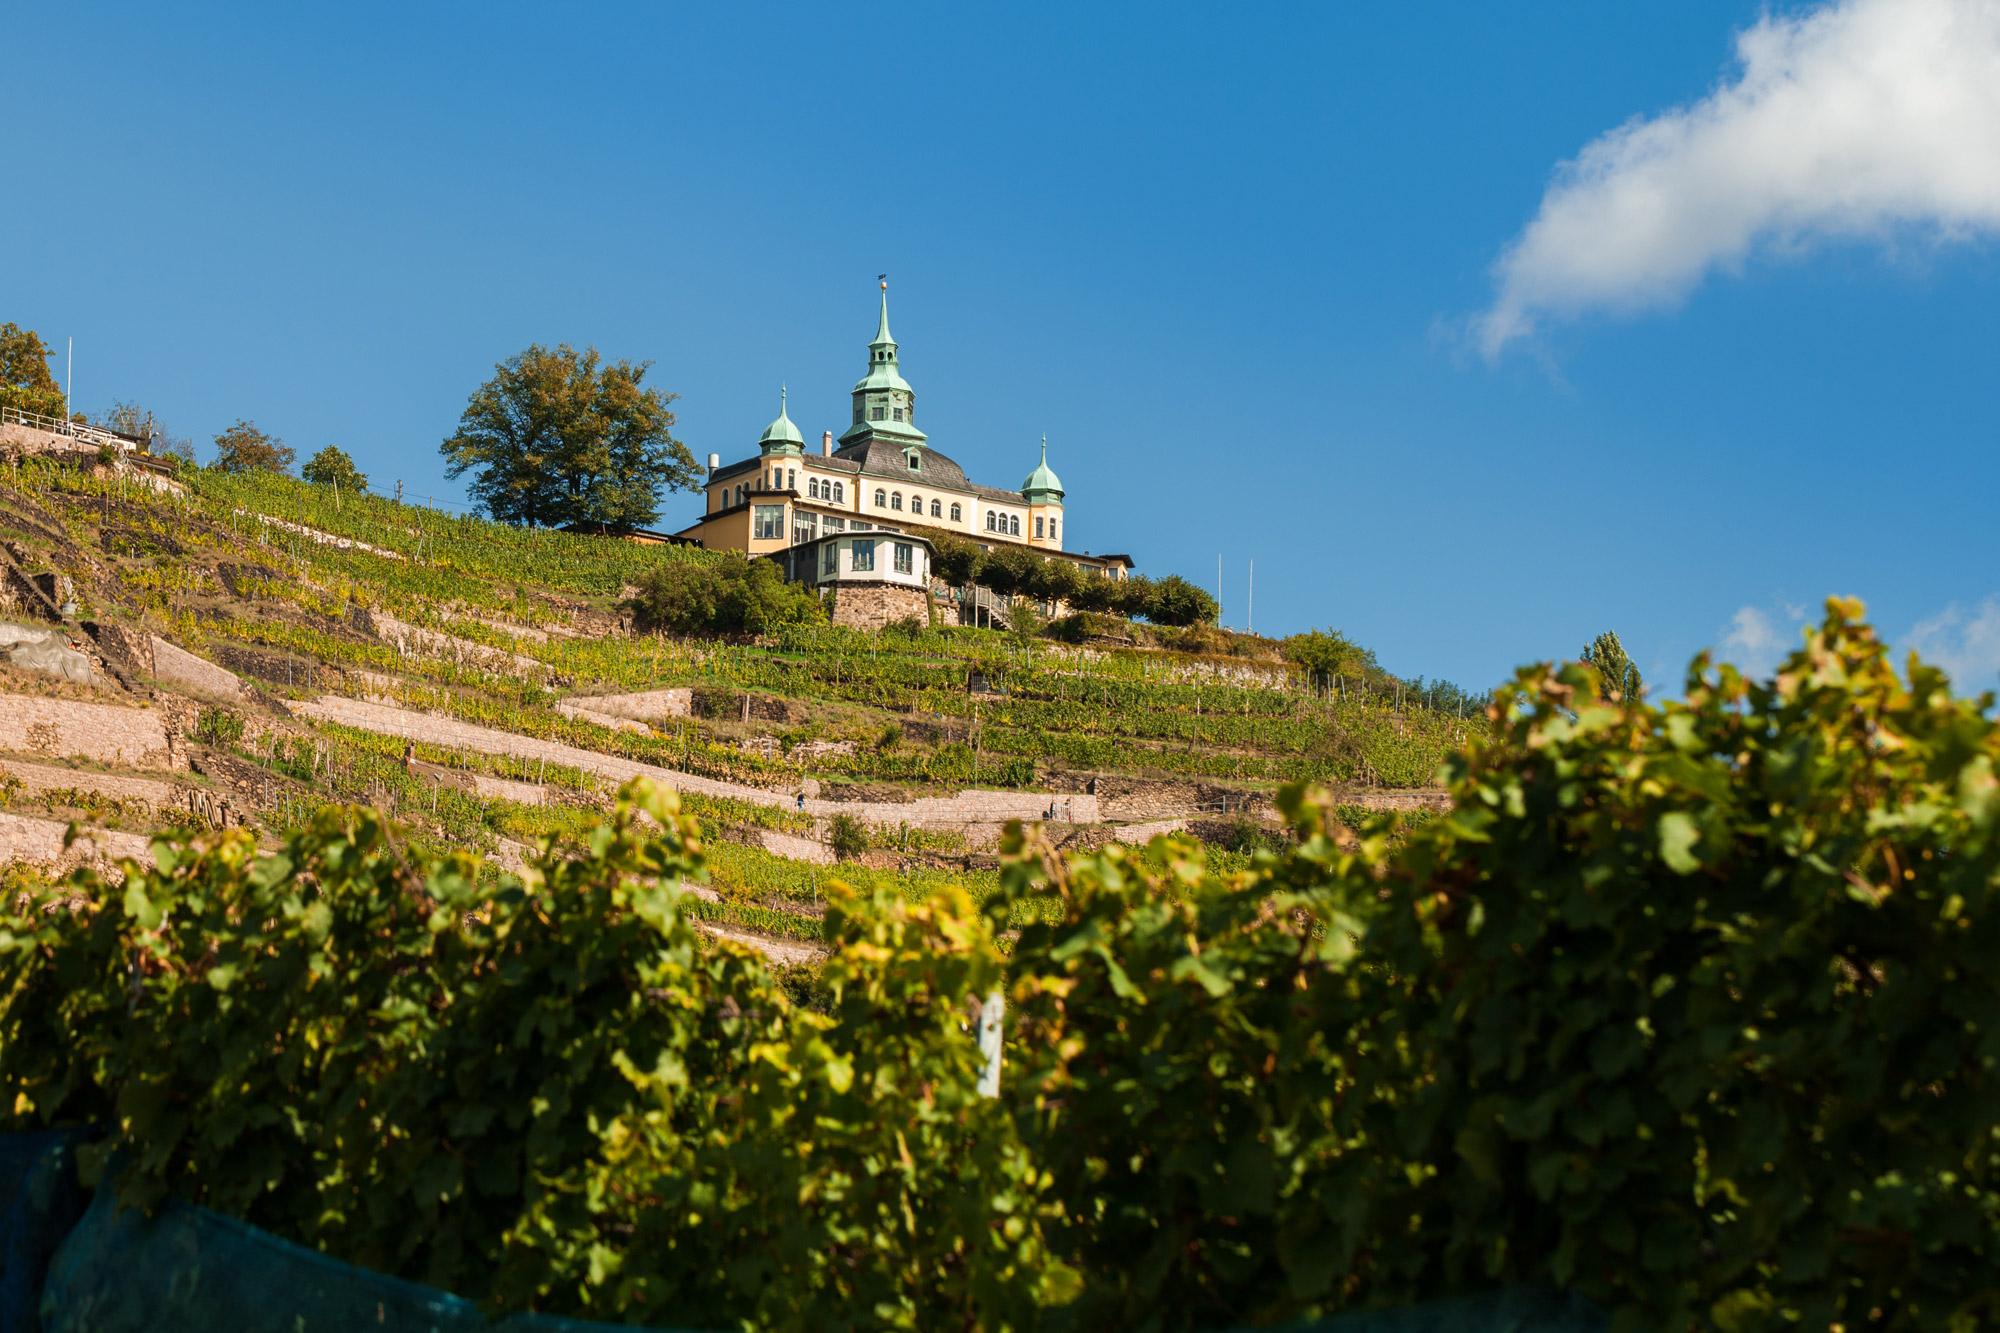 De mooiste steden in Saksen - Radebeul